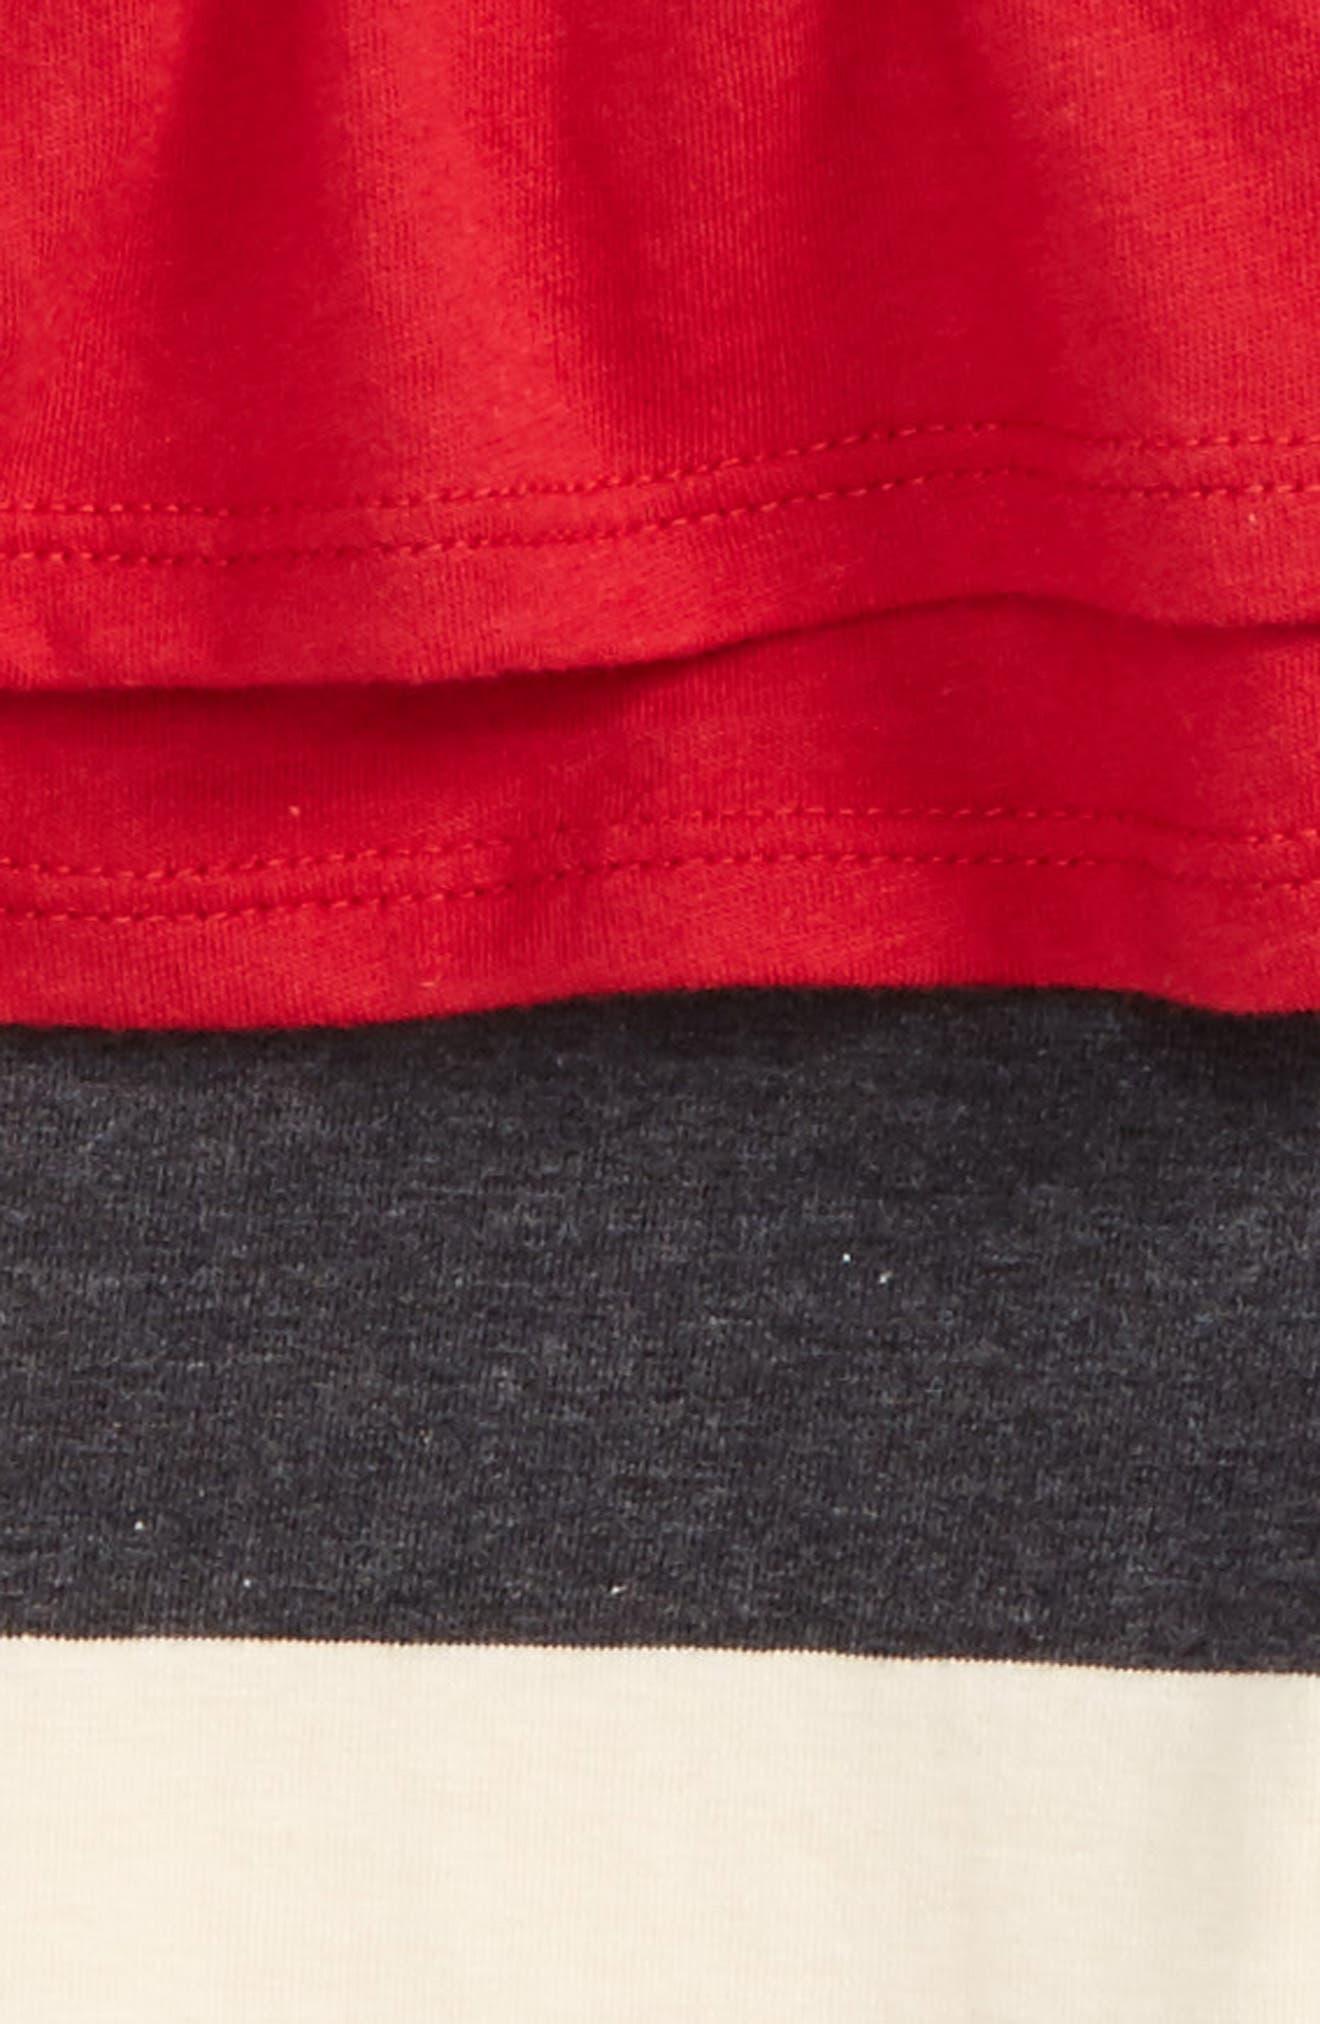 Thermal Ruffle Skater Dress & Leggings Set,                             Alternate thumbnail 4, color,